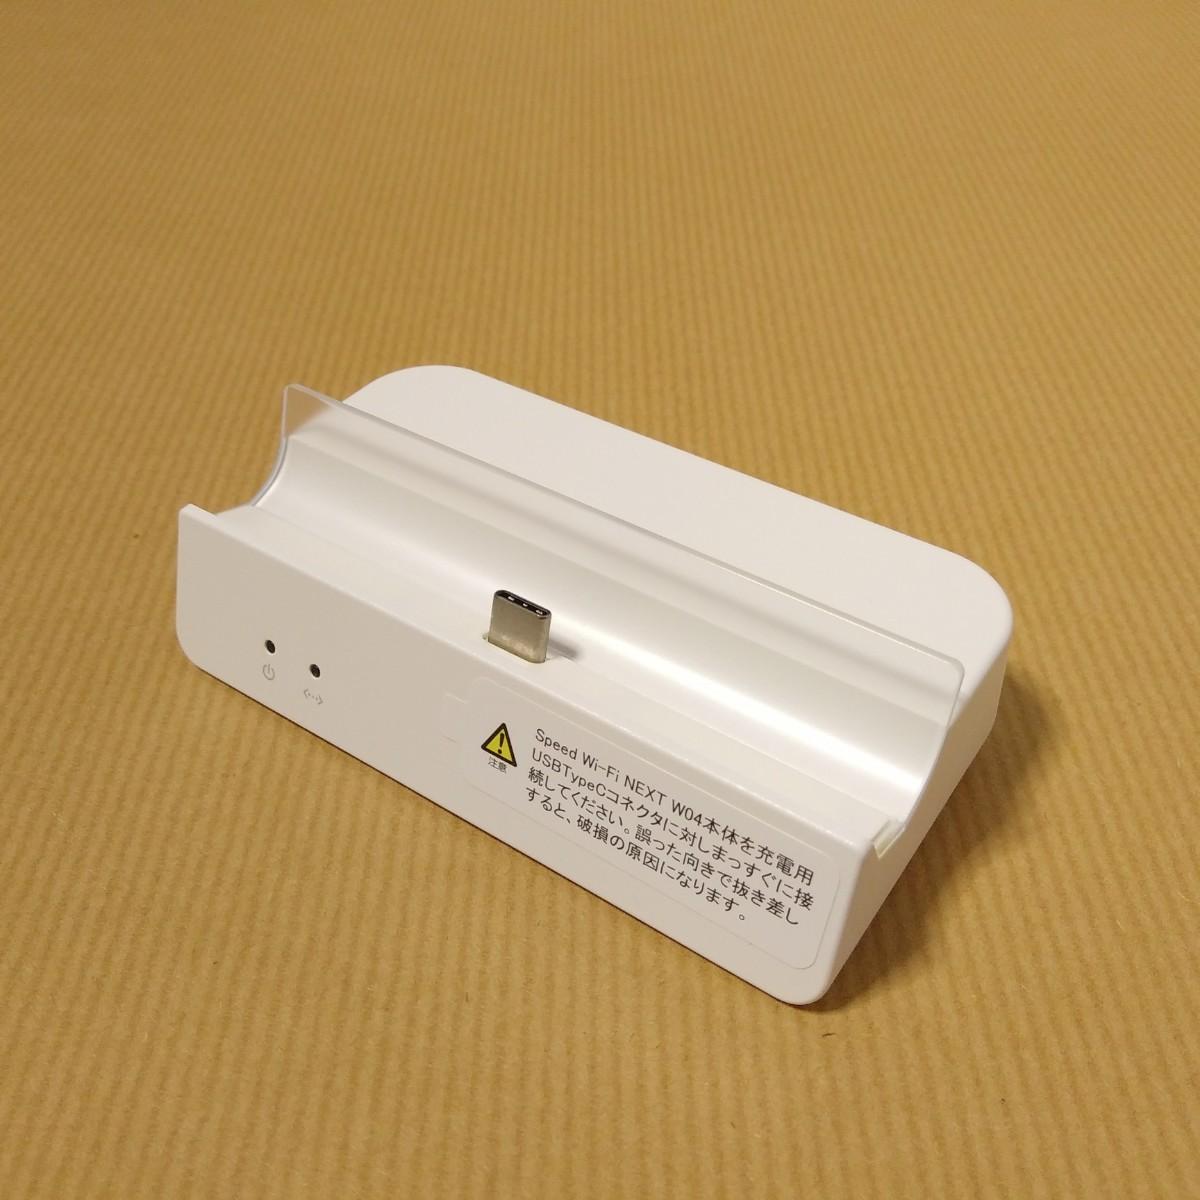 Speed Wi-Fi NEXT W04 専用クレードル HWD35PUU